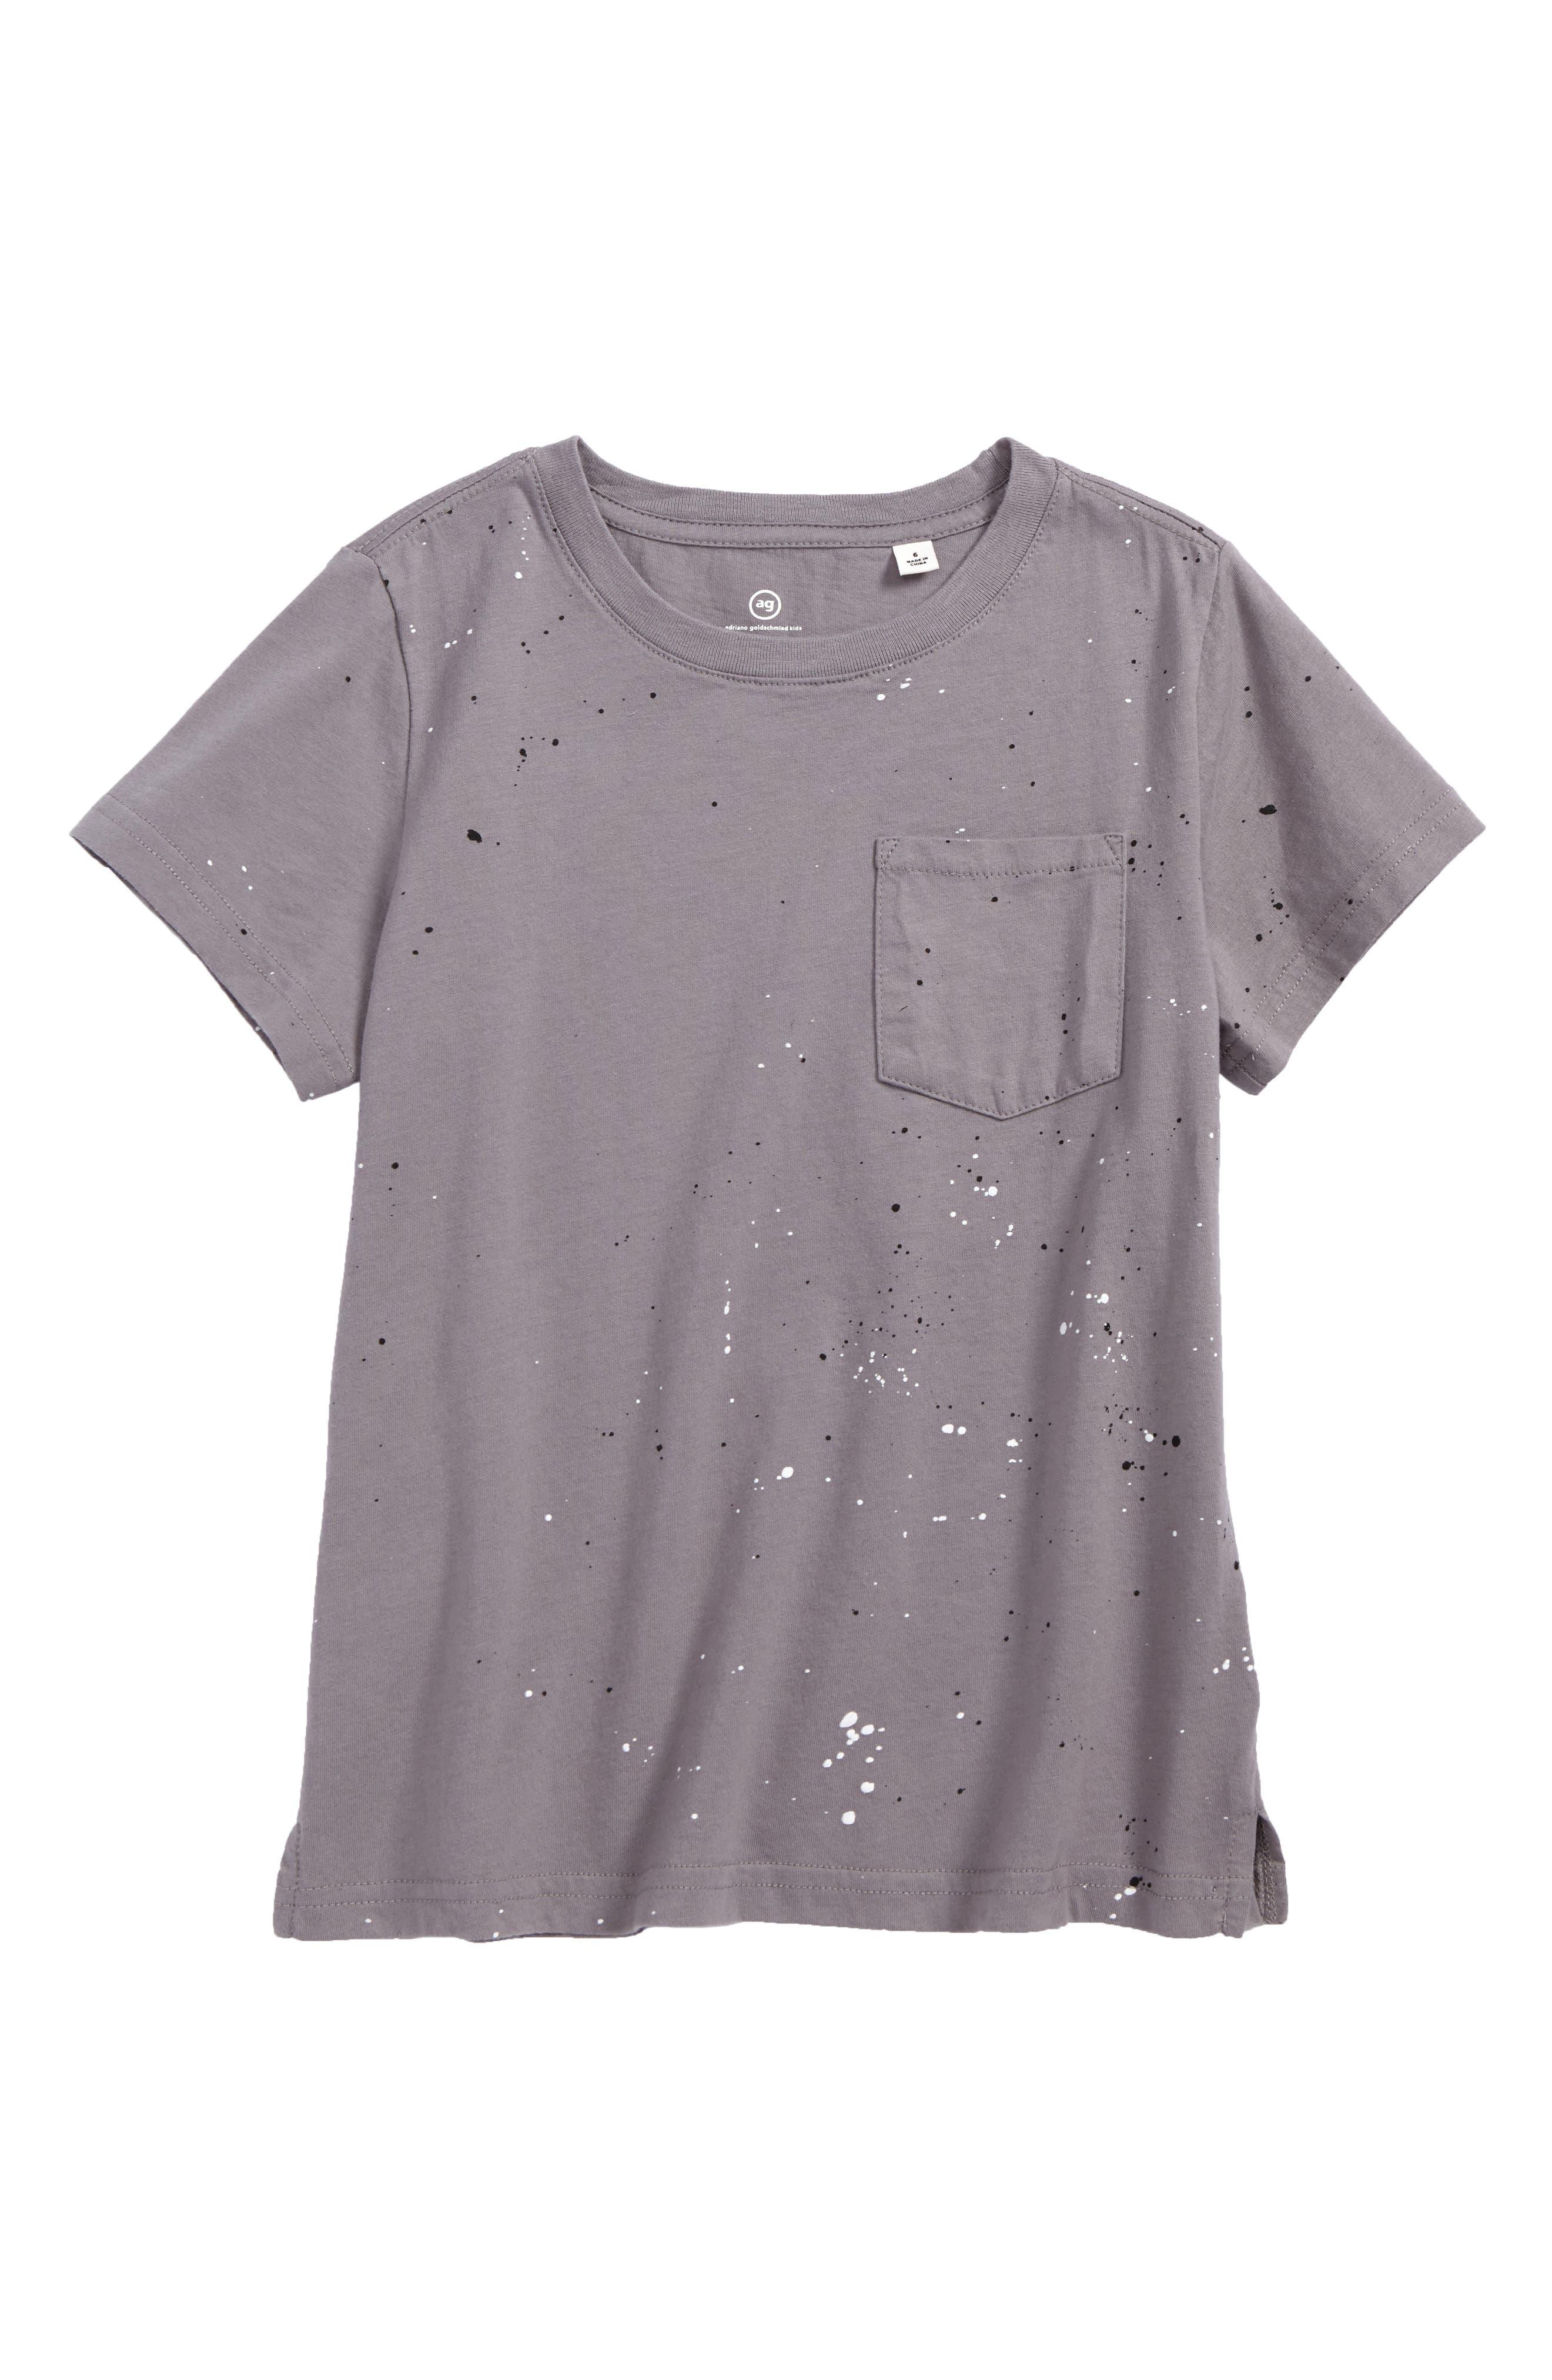 AG Paint Splatter T-Shirt (Little Boys & Big Boys)